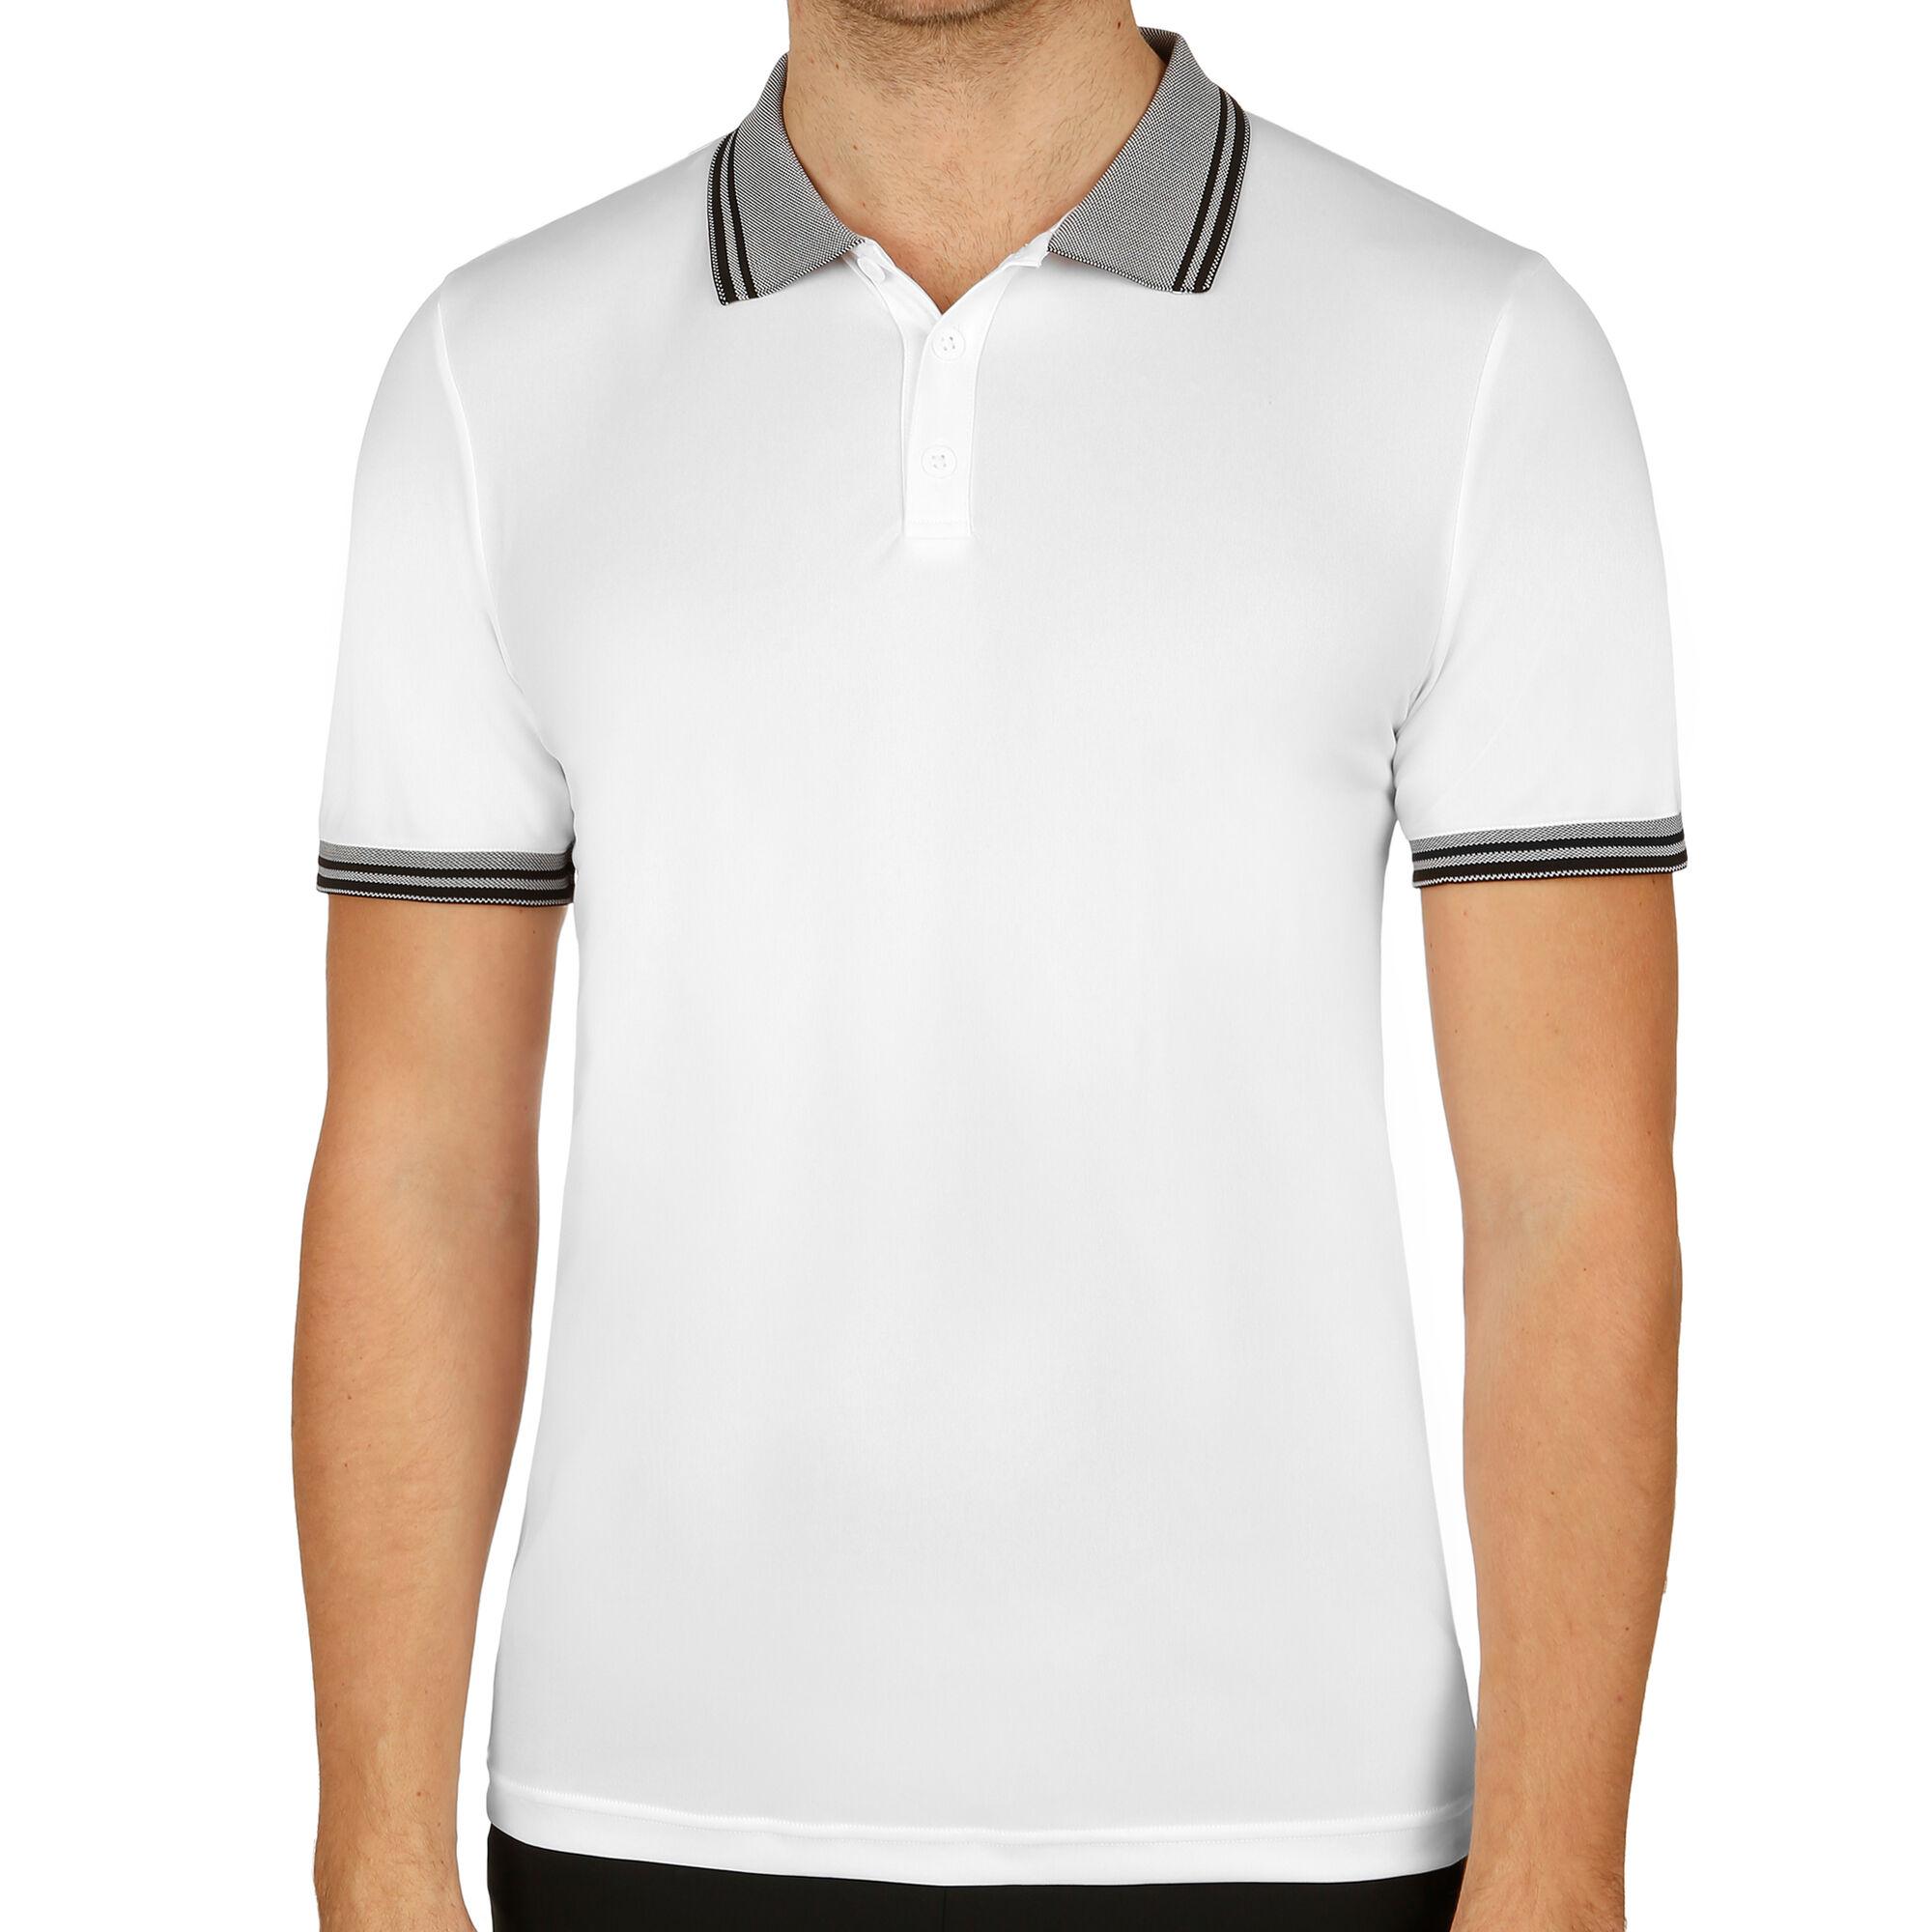 6233e0bbc1 Wilson Team Polo Hommes - Blanc , Gris online kopen | Tennis-Point